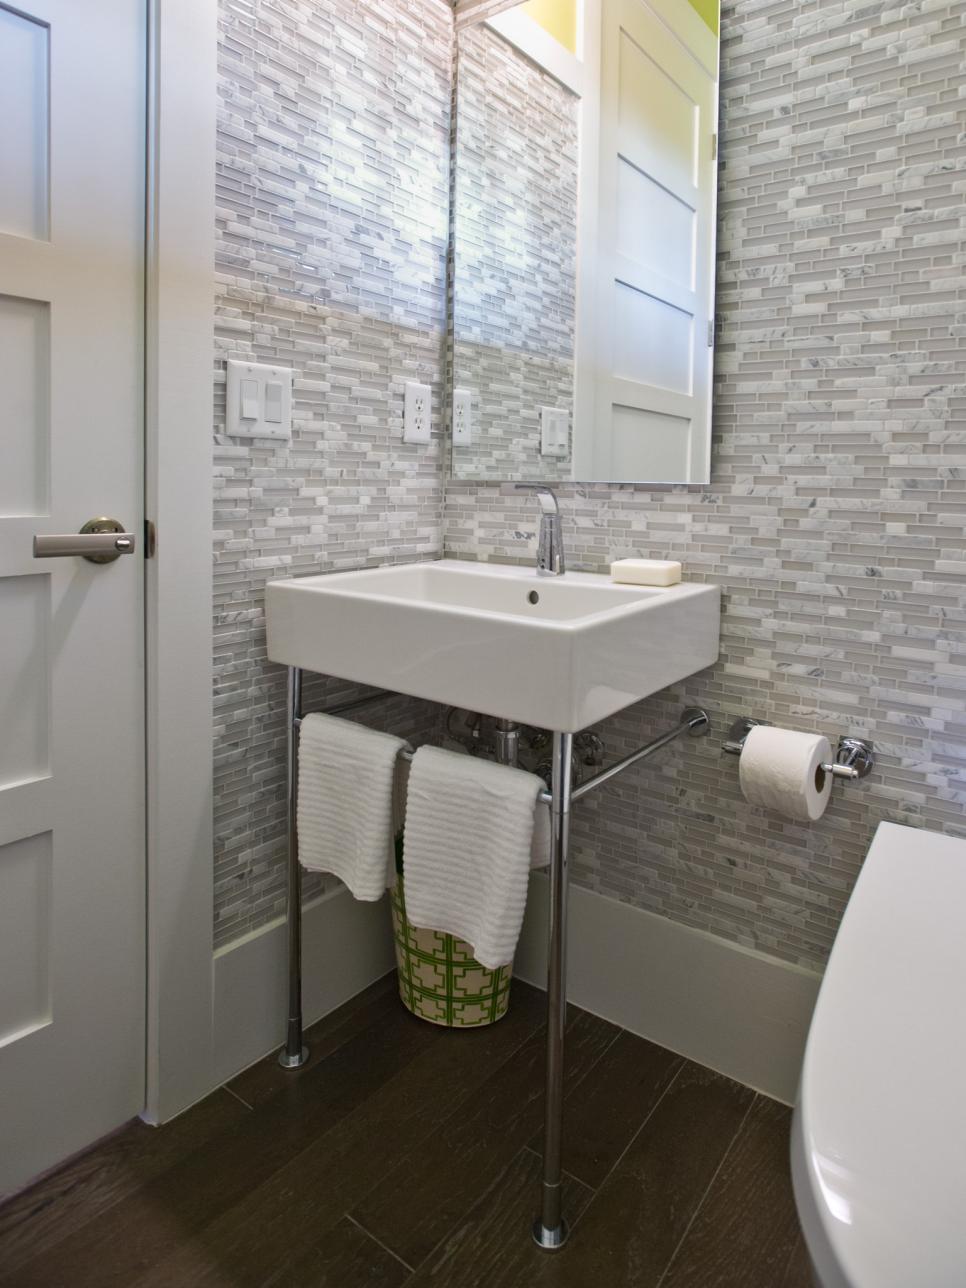 Foyer Bathroom Ideas : Hgtv smart home foyer pictures